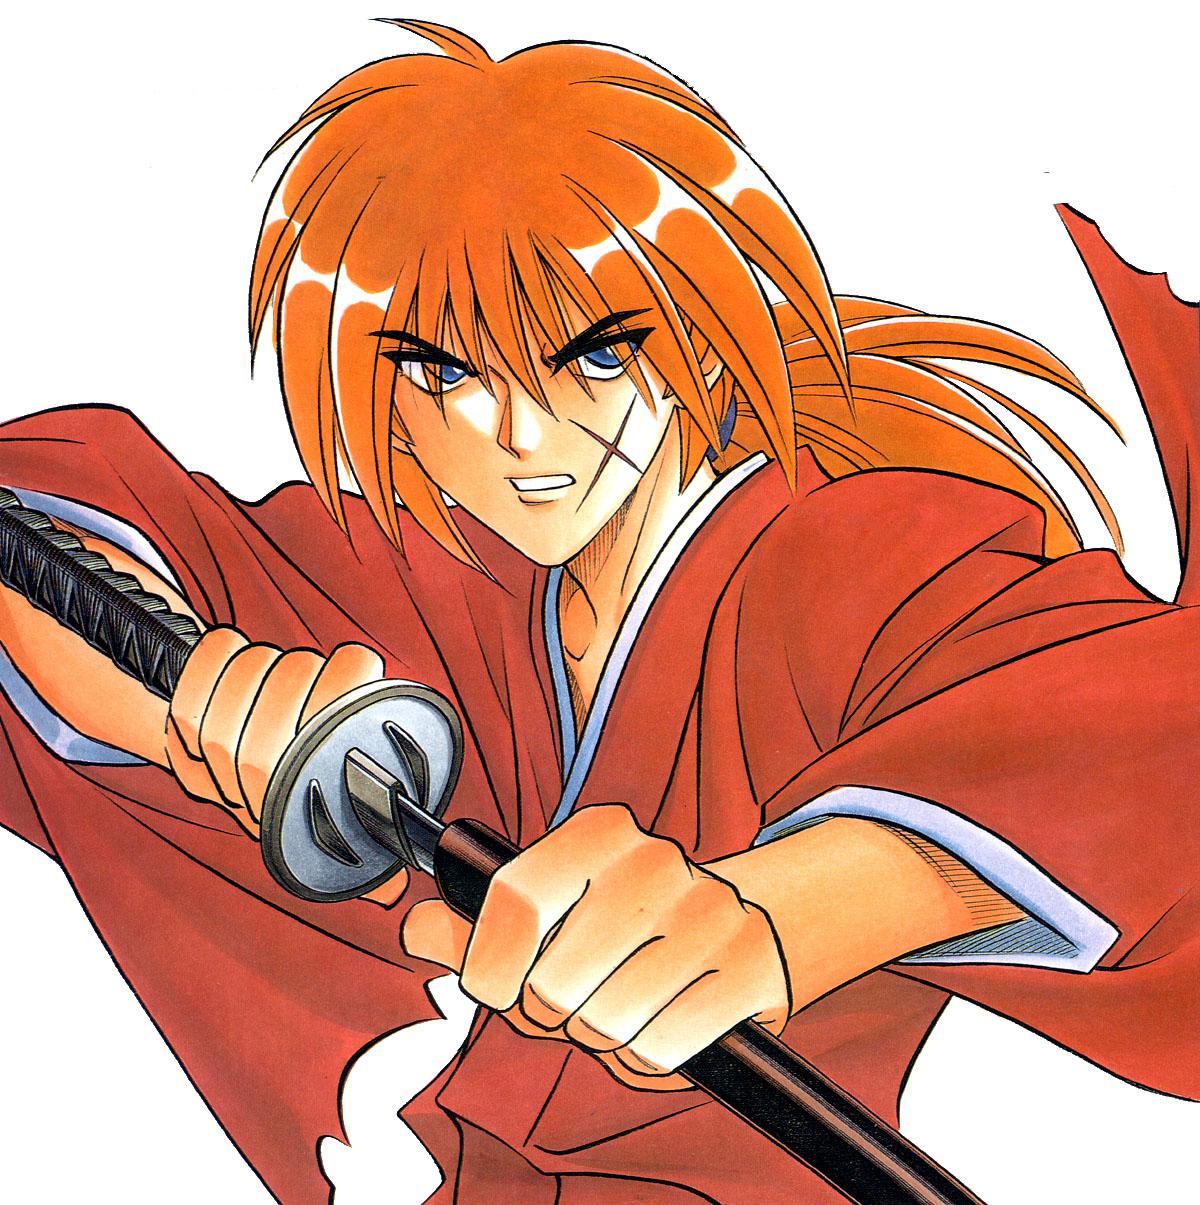 Rurouni Kenshin: Let's Get Ready To Rumble!